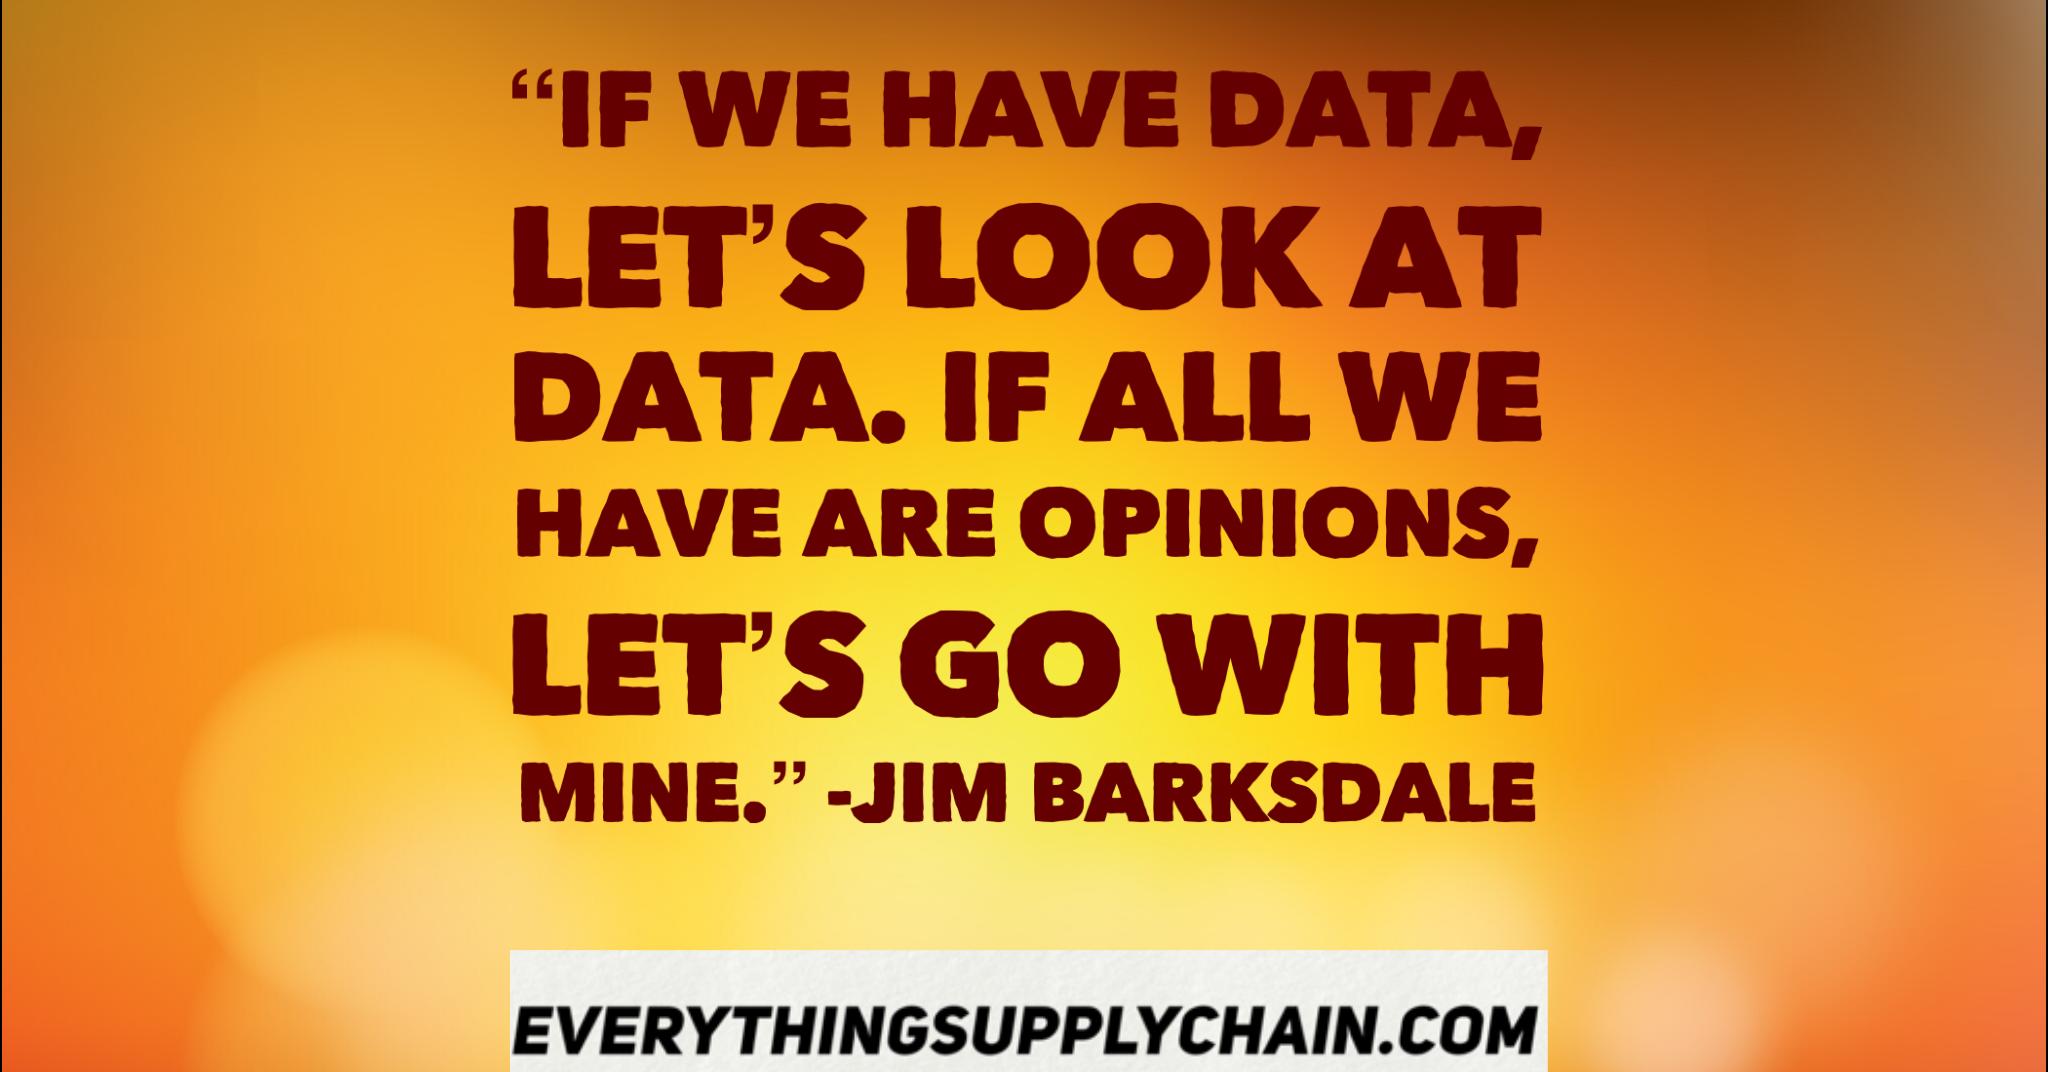 Analytics and Big Data Quotes